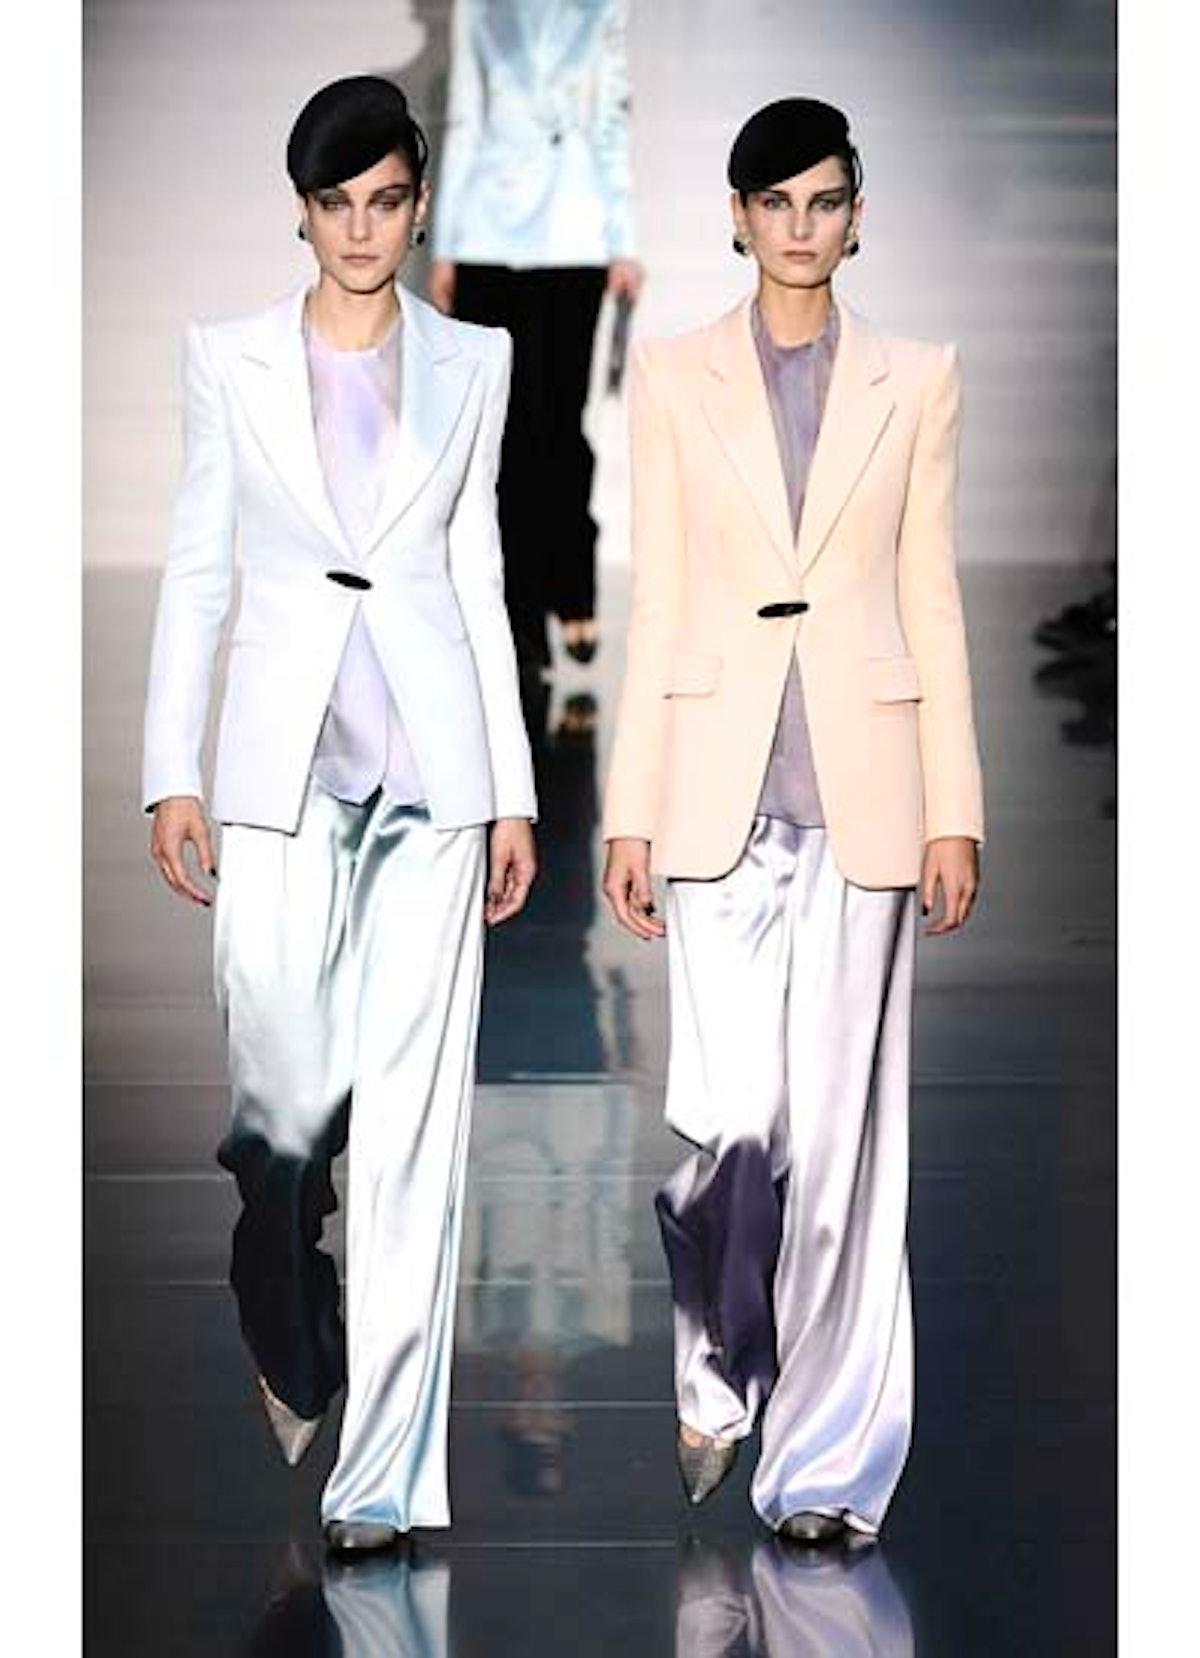 fass-giorgio-armani-couture-2012-runway-11-v.jpg